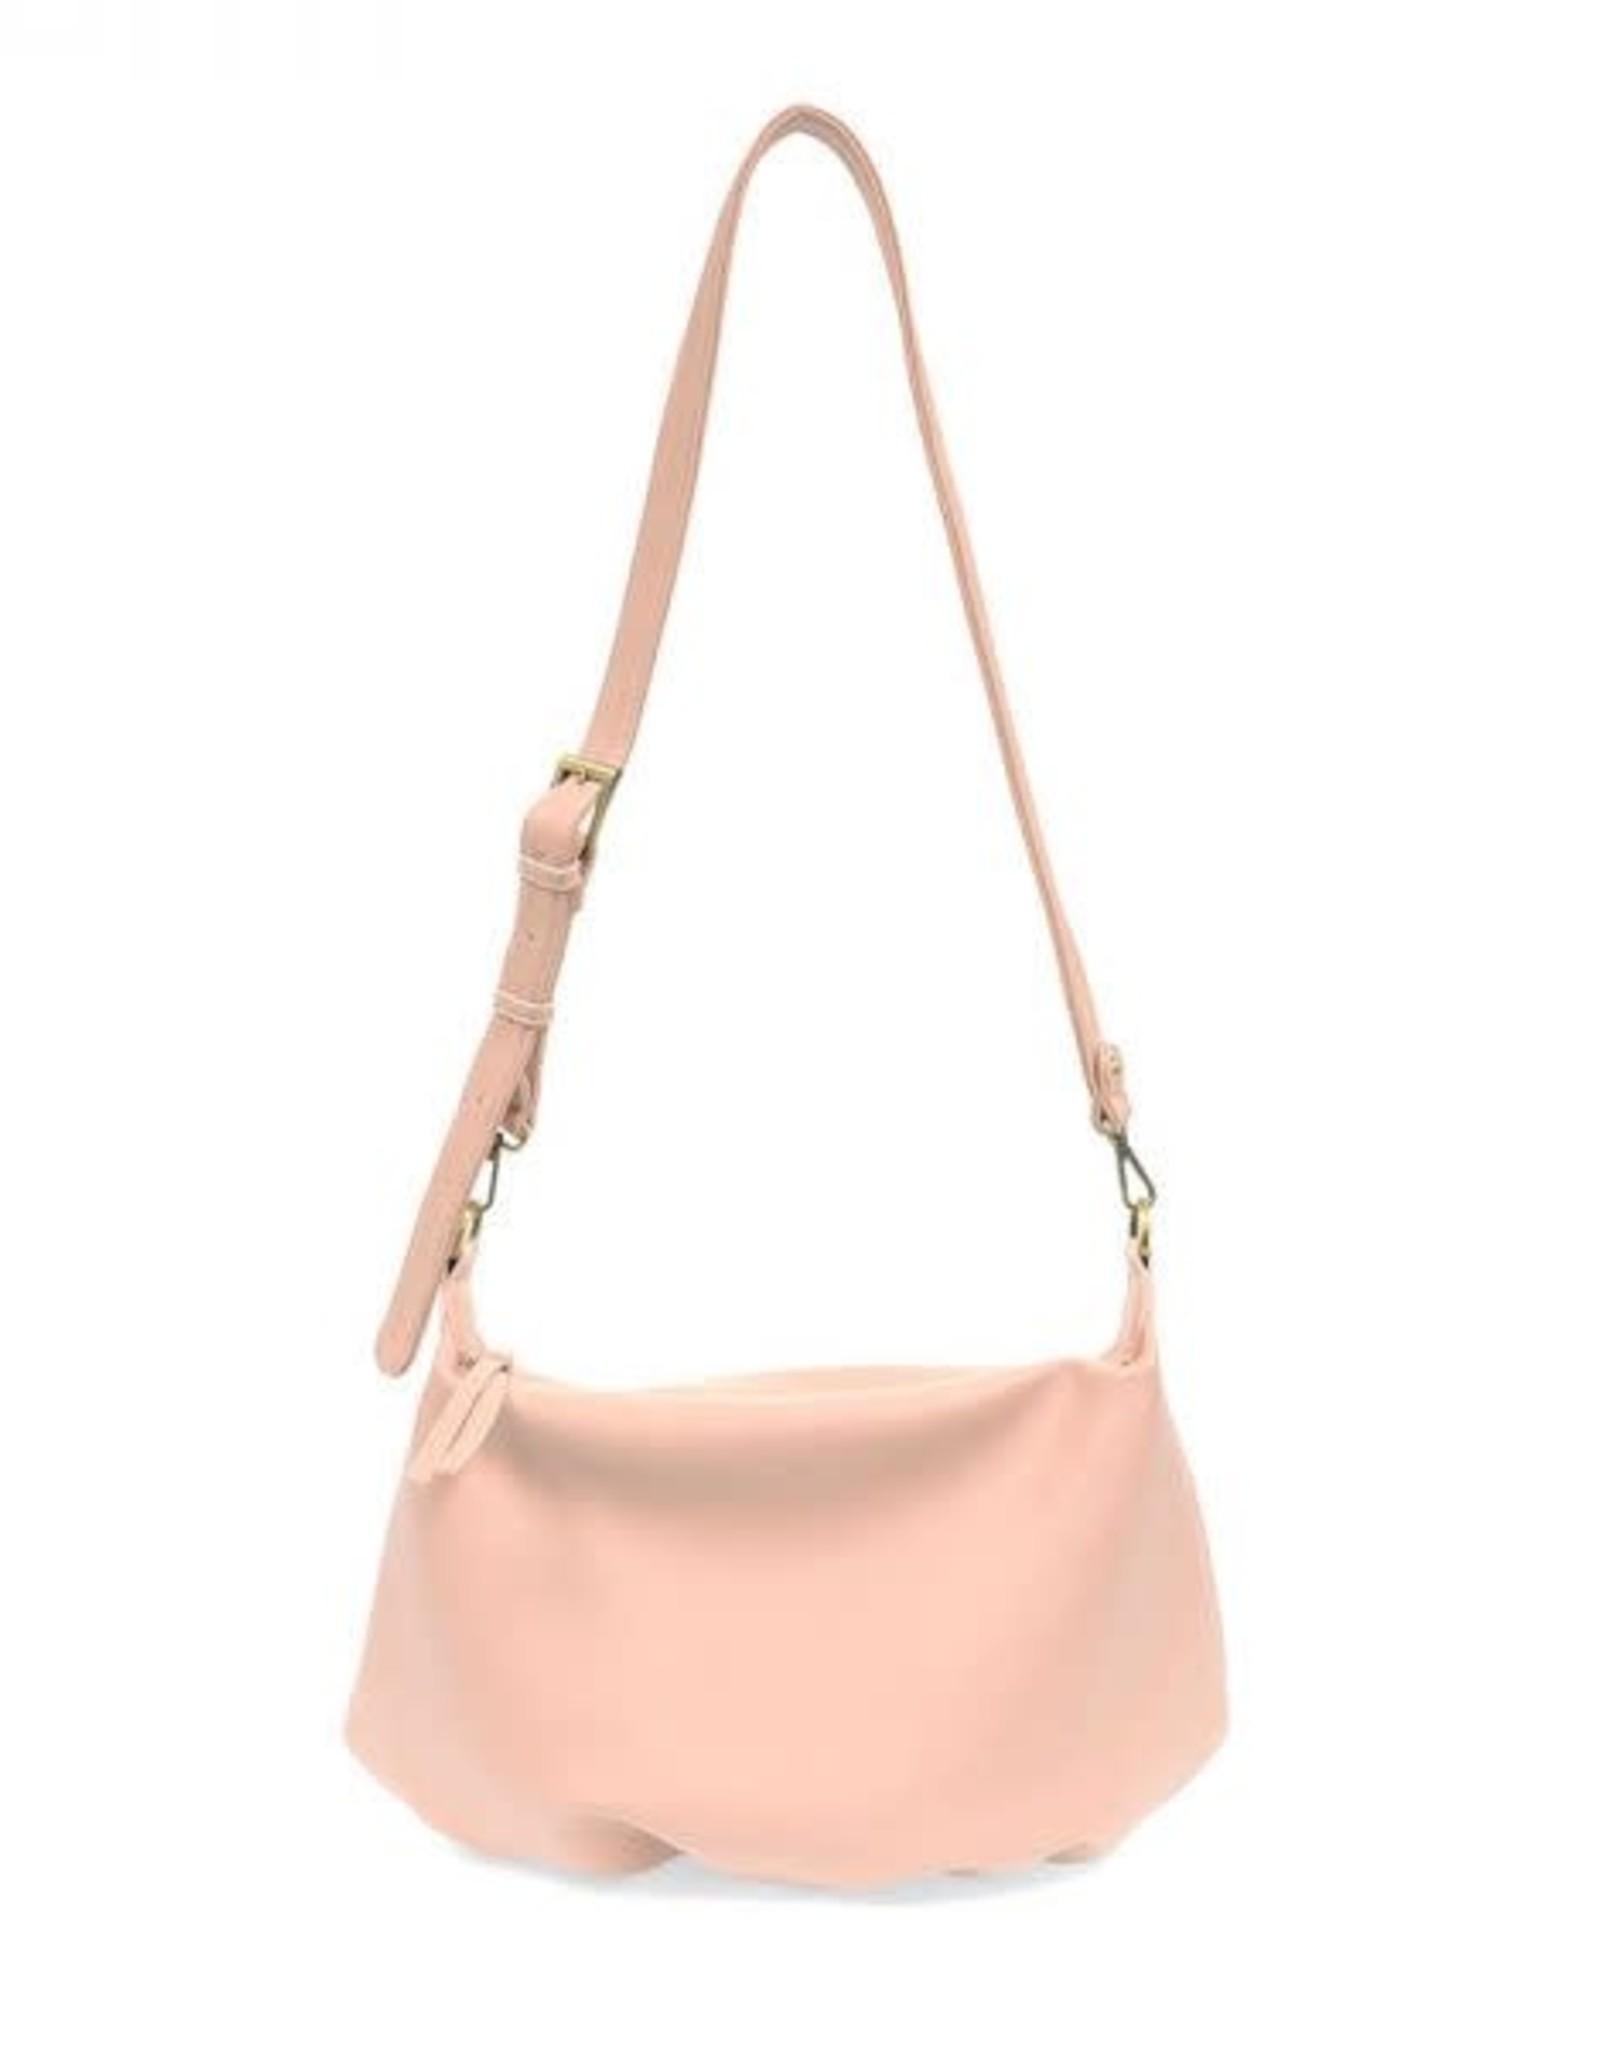 - Petal Pink Convertible Hobo Handbag